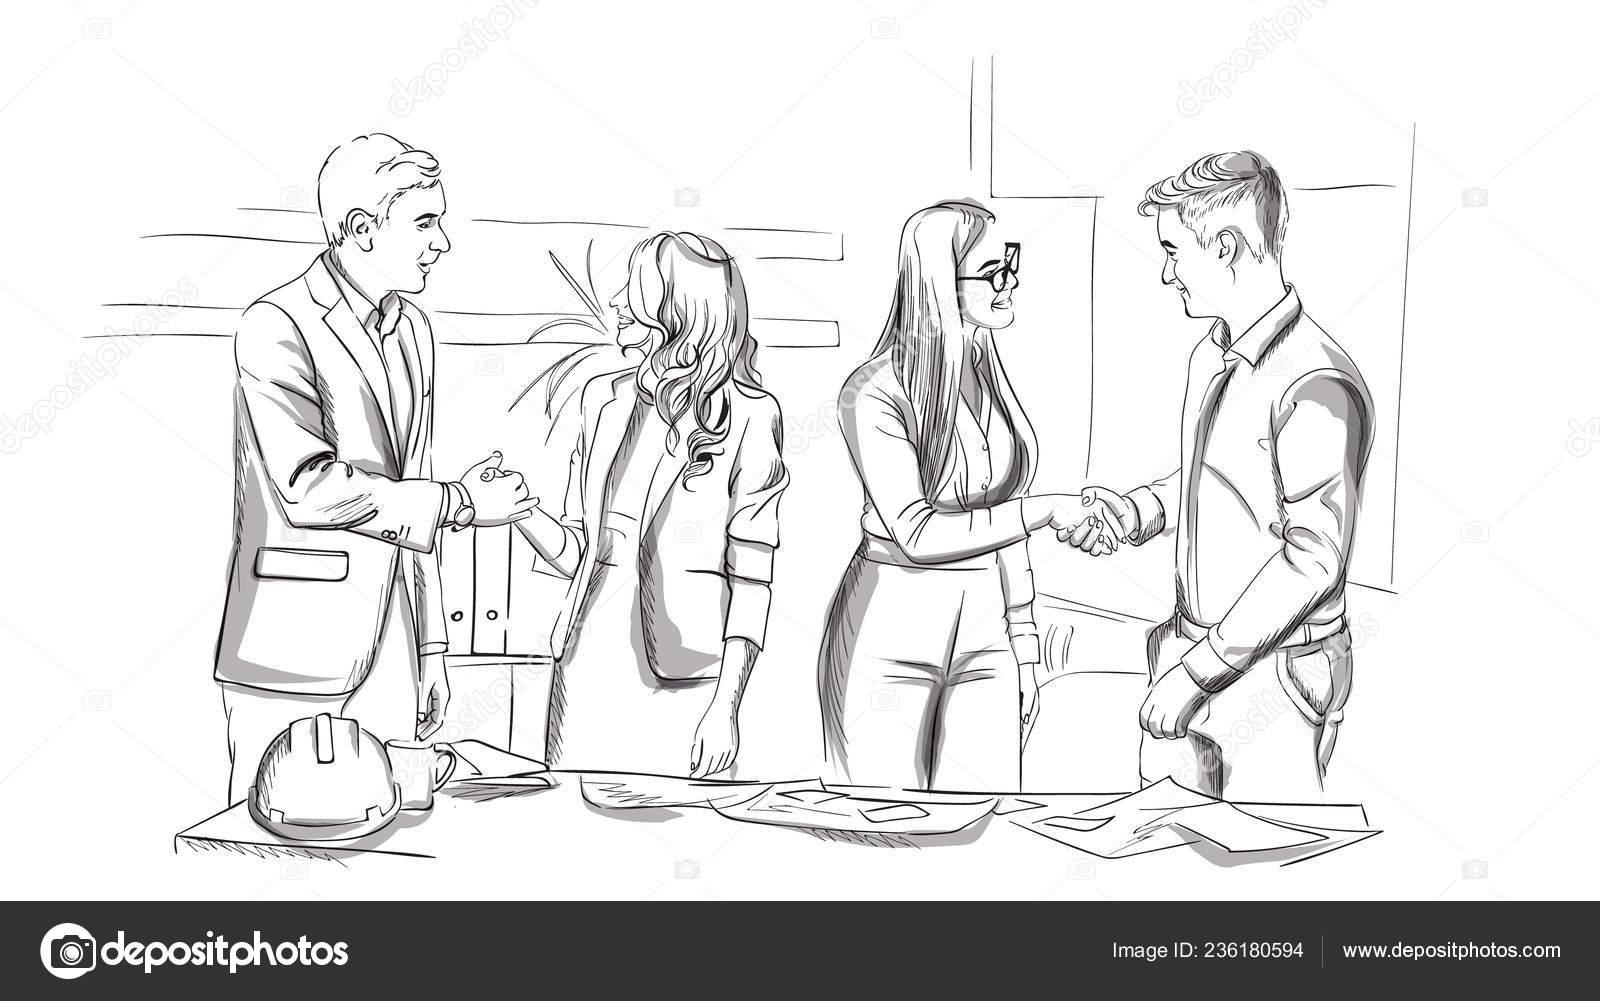 Businessmen and women succesful team shaking hands Vector sketch